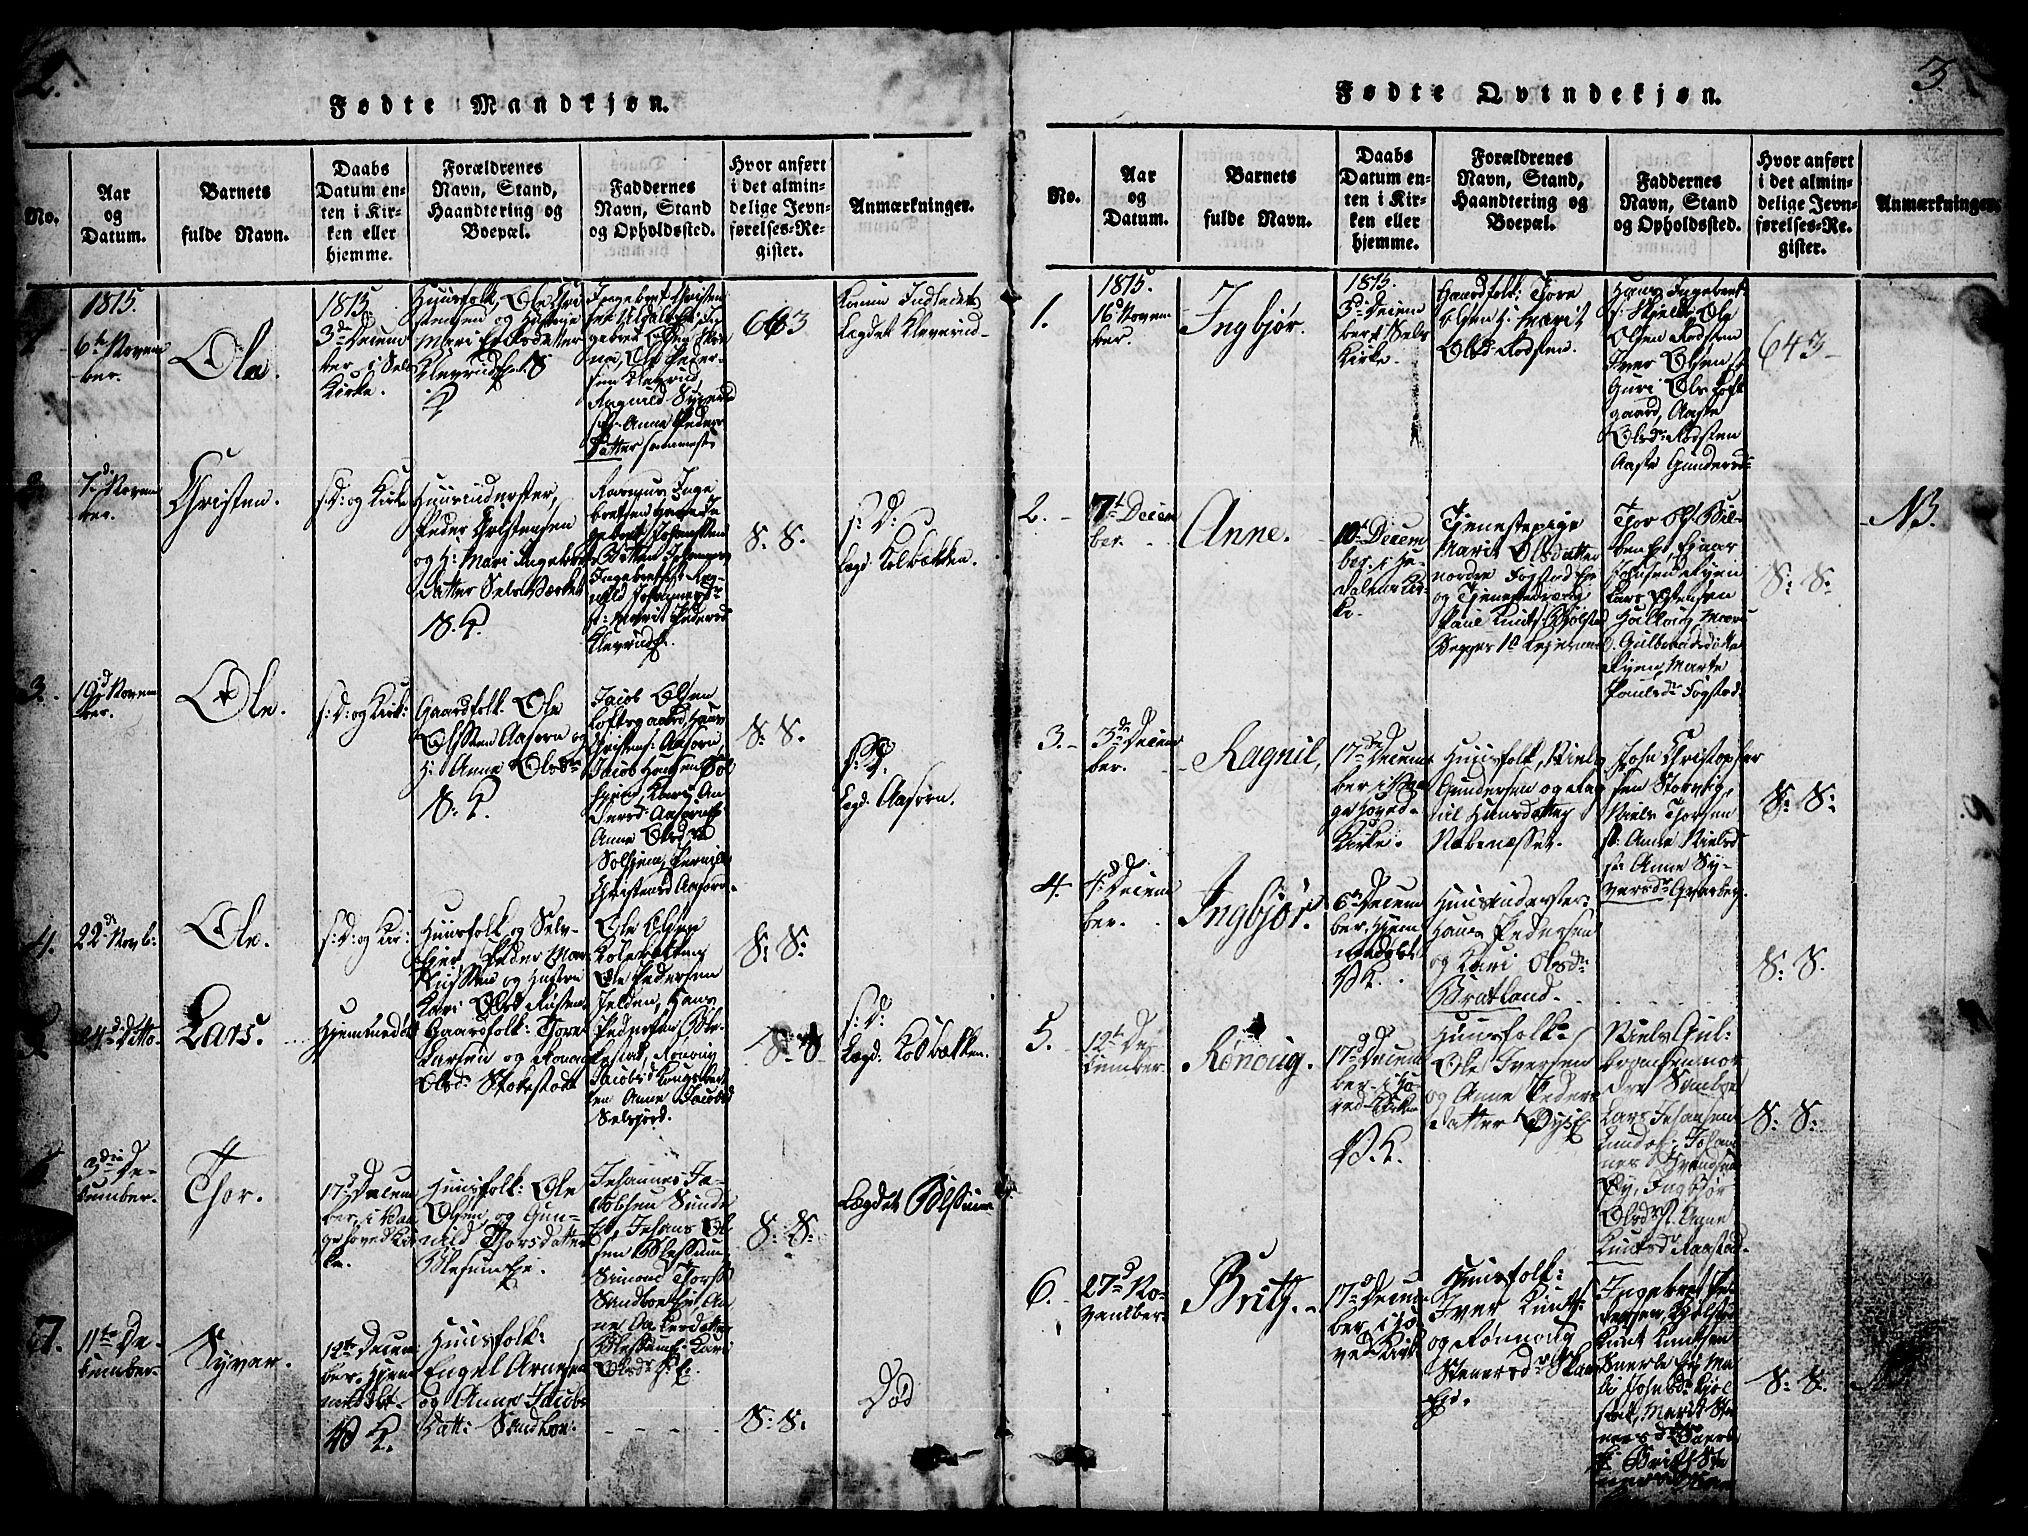 SAH, Vågå prestekontor, Ministerialbok nr. 3, 1815-1827, s. 2-3